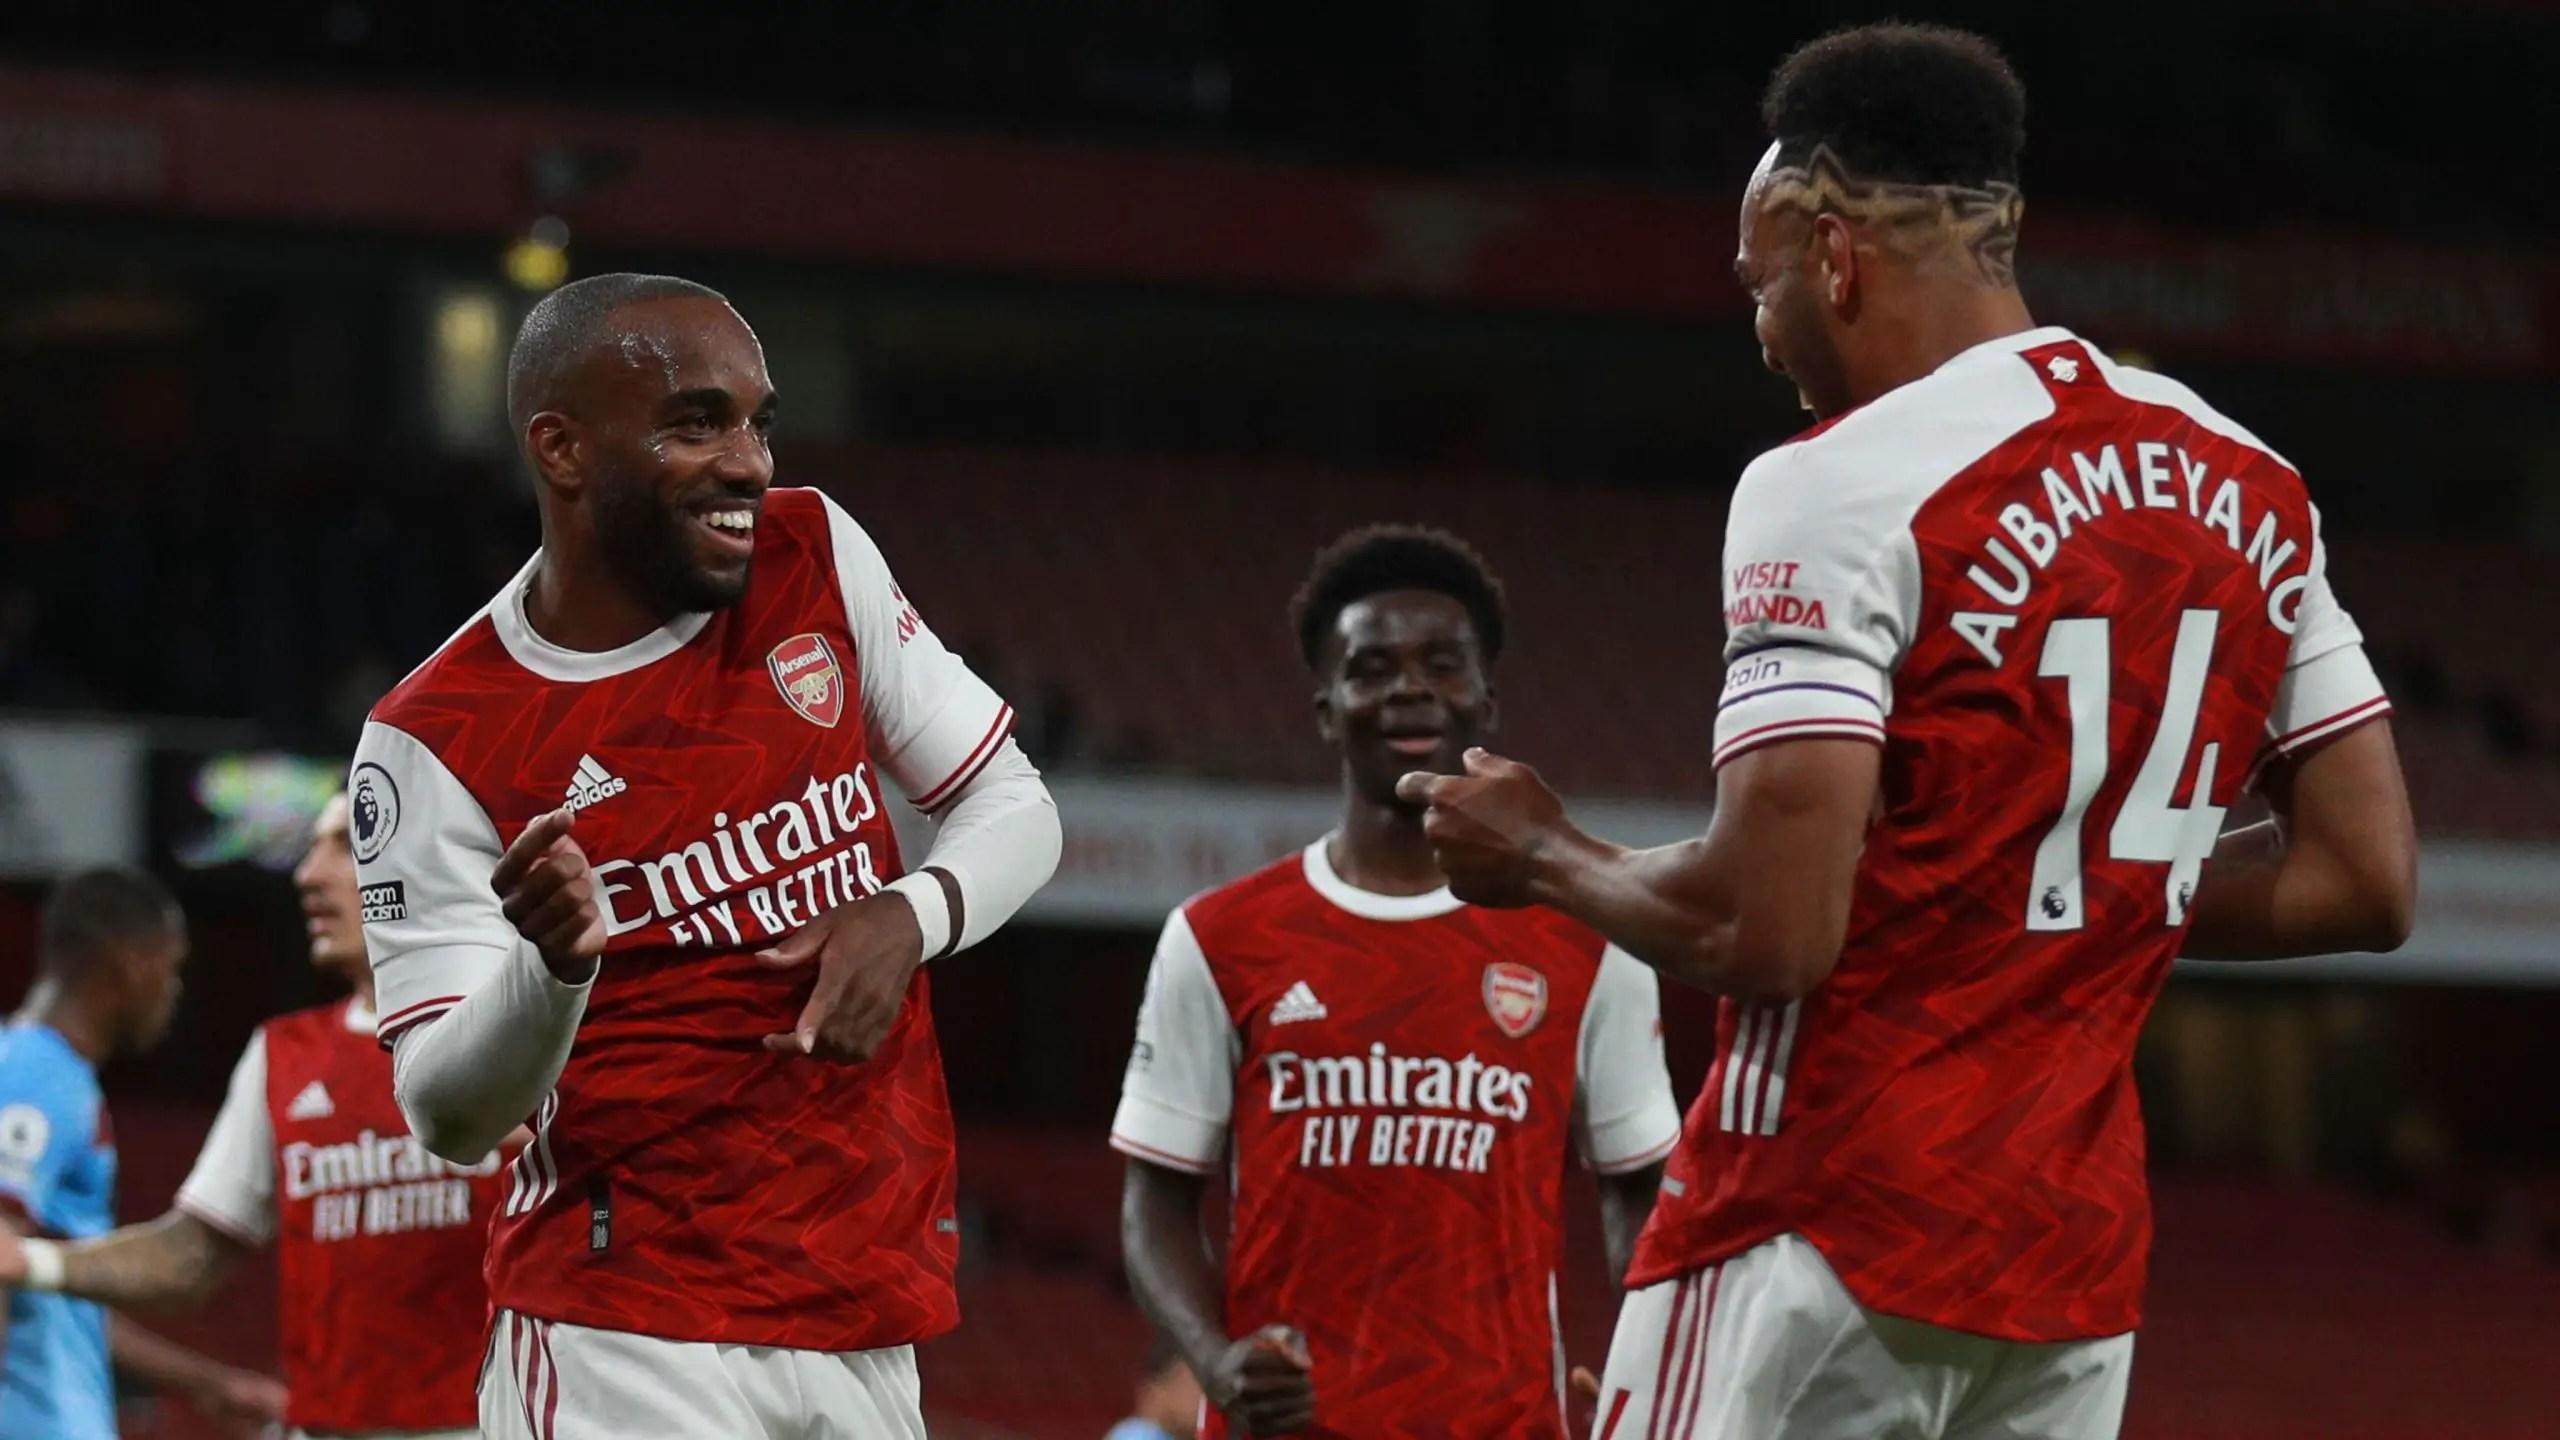 Premier League: Saka Shines As Arsenal's Late Strike Sink West Ham United